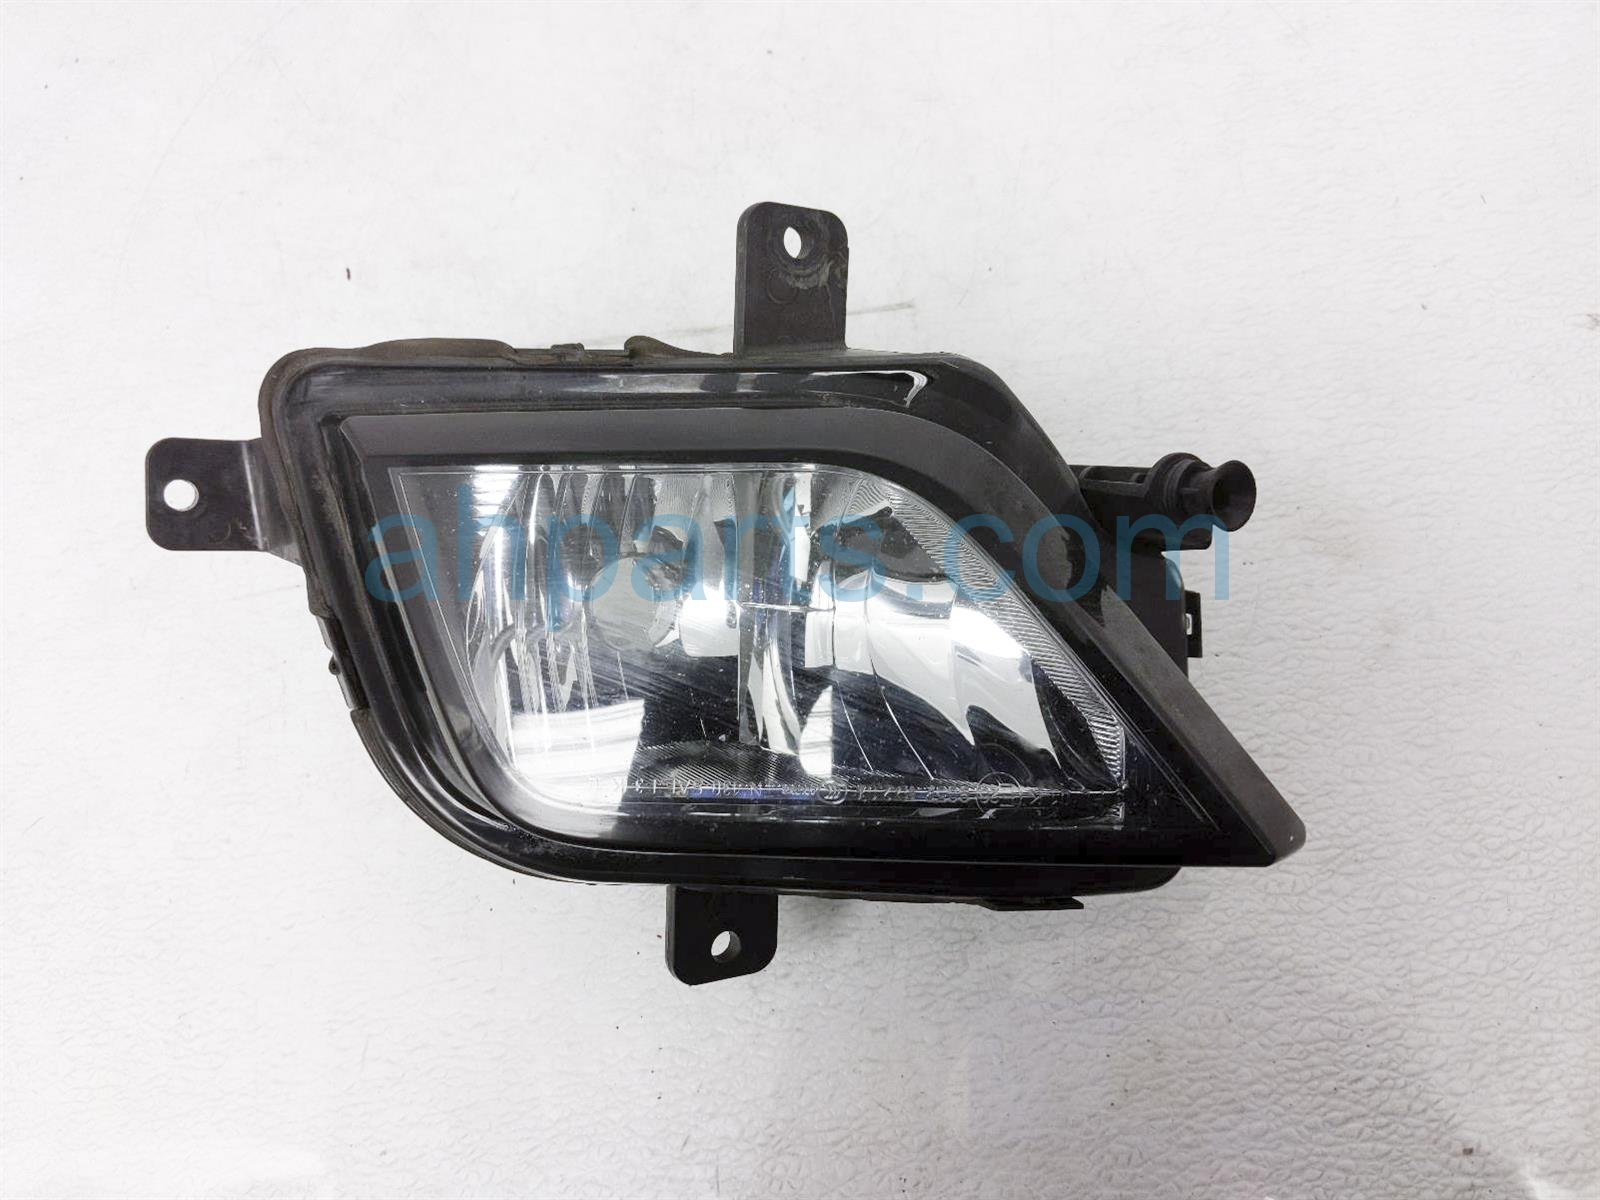 2018 Volkswagen Jetta Driver Fog Lamp / Light 5C7 941 699 R Replacement